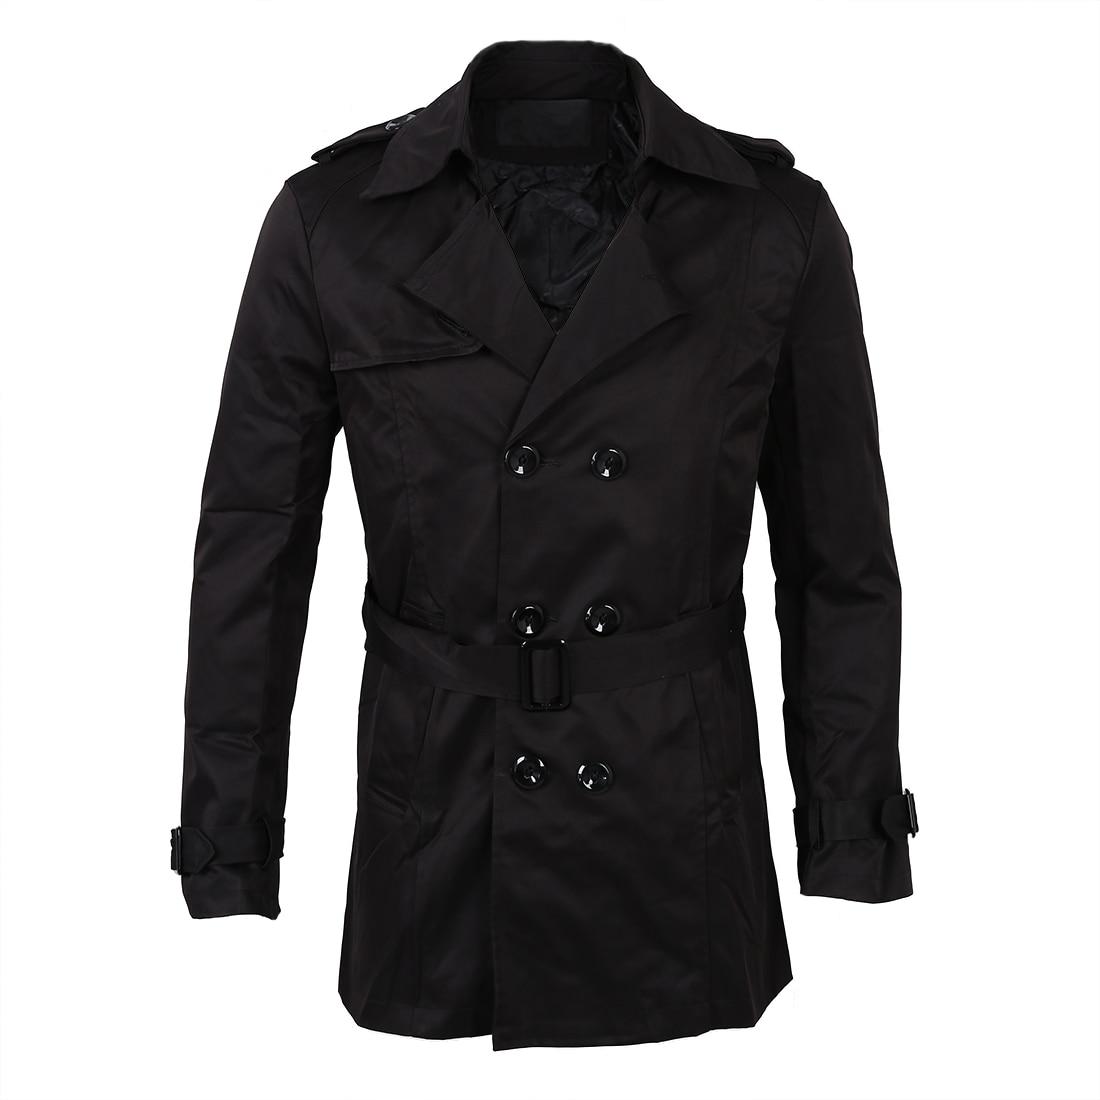 Trench Coat Men Winter Clothes Double Breasted Steampunk Men Jackets Long Outwear Casaco Masculino Abrigo Hombre